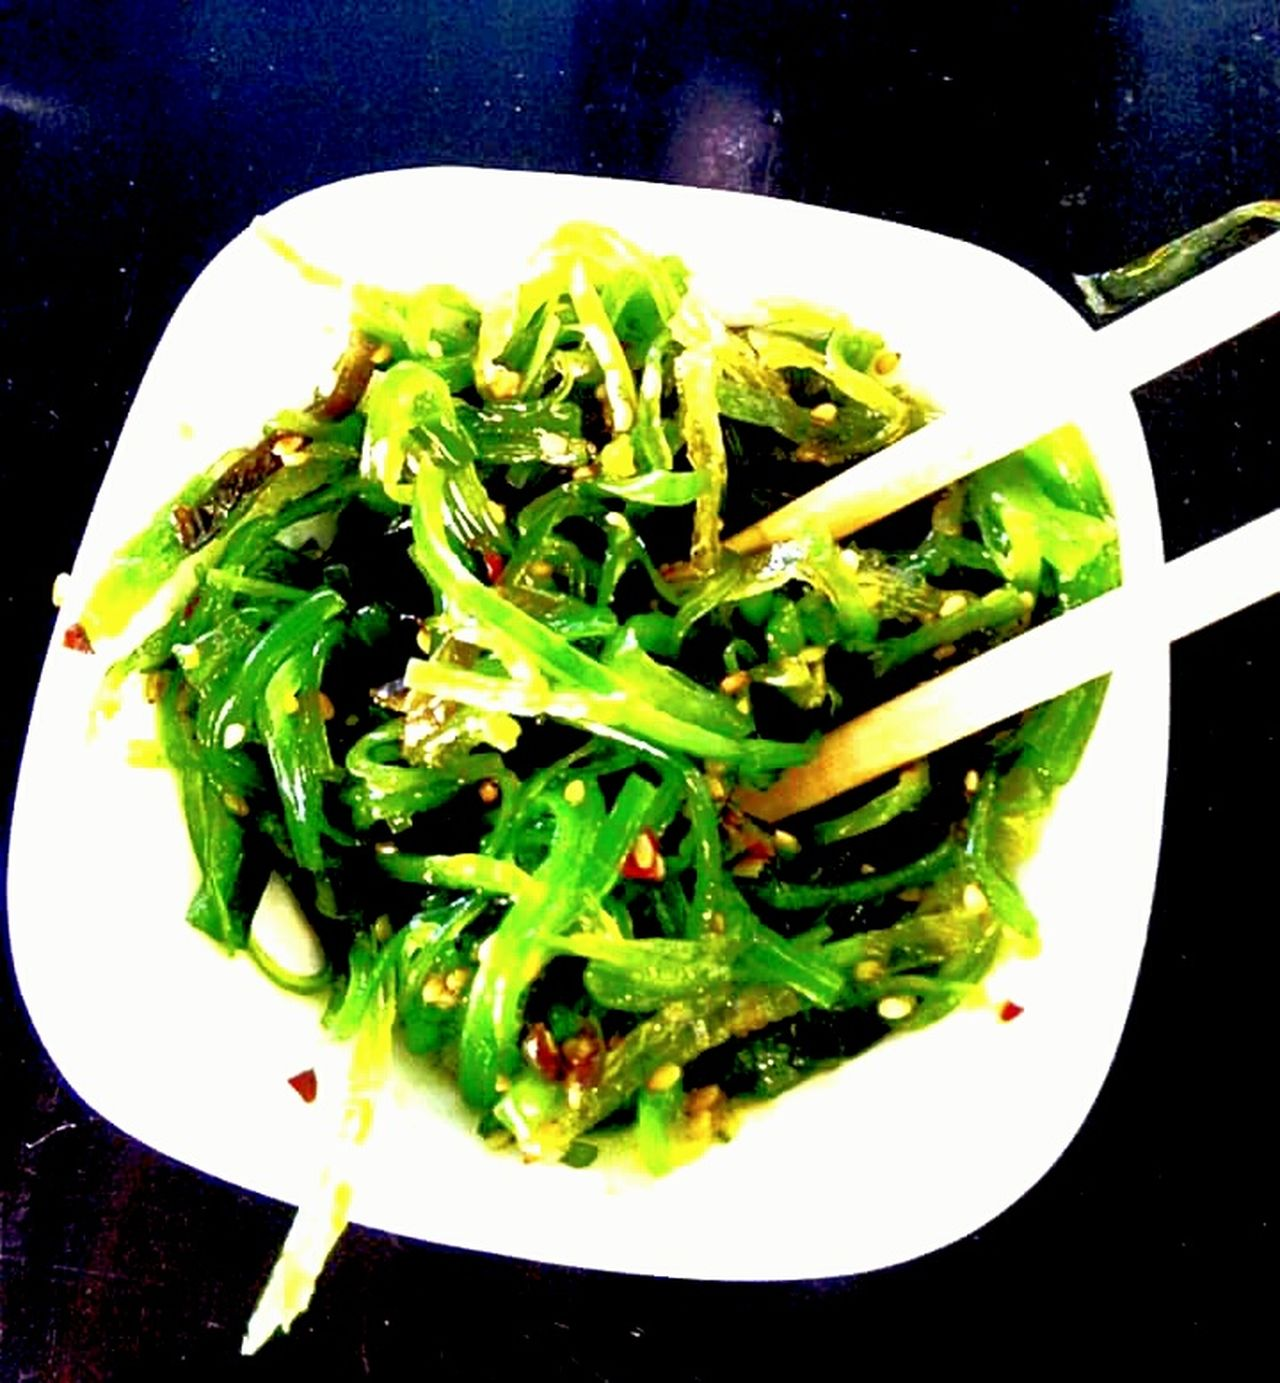 Food Porn Awards My Favorite Salad Seaweed Salad Roasted Sesame Seeds Emerald Green